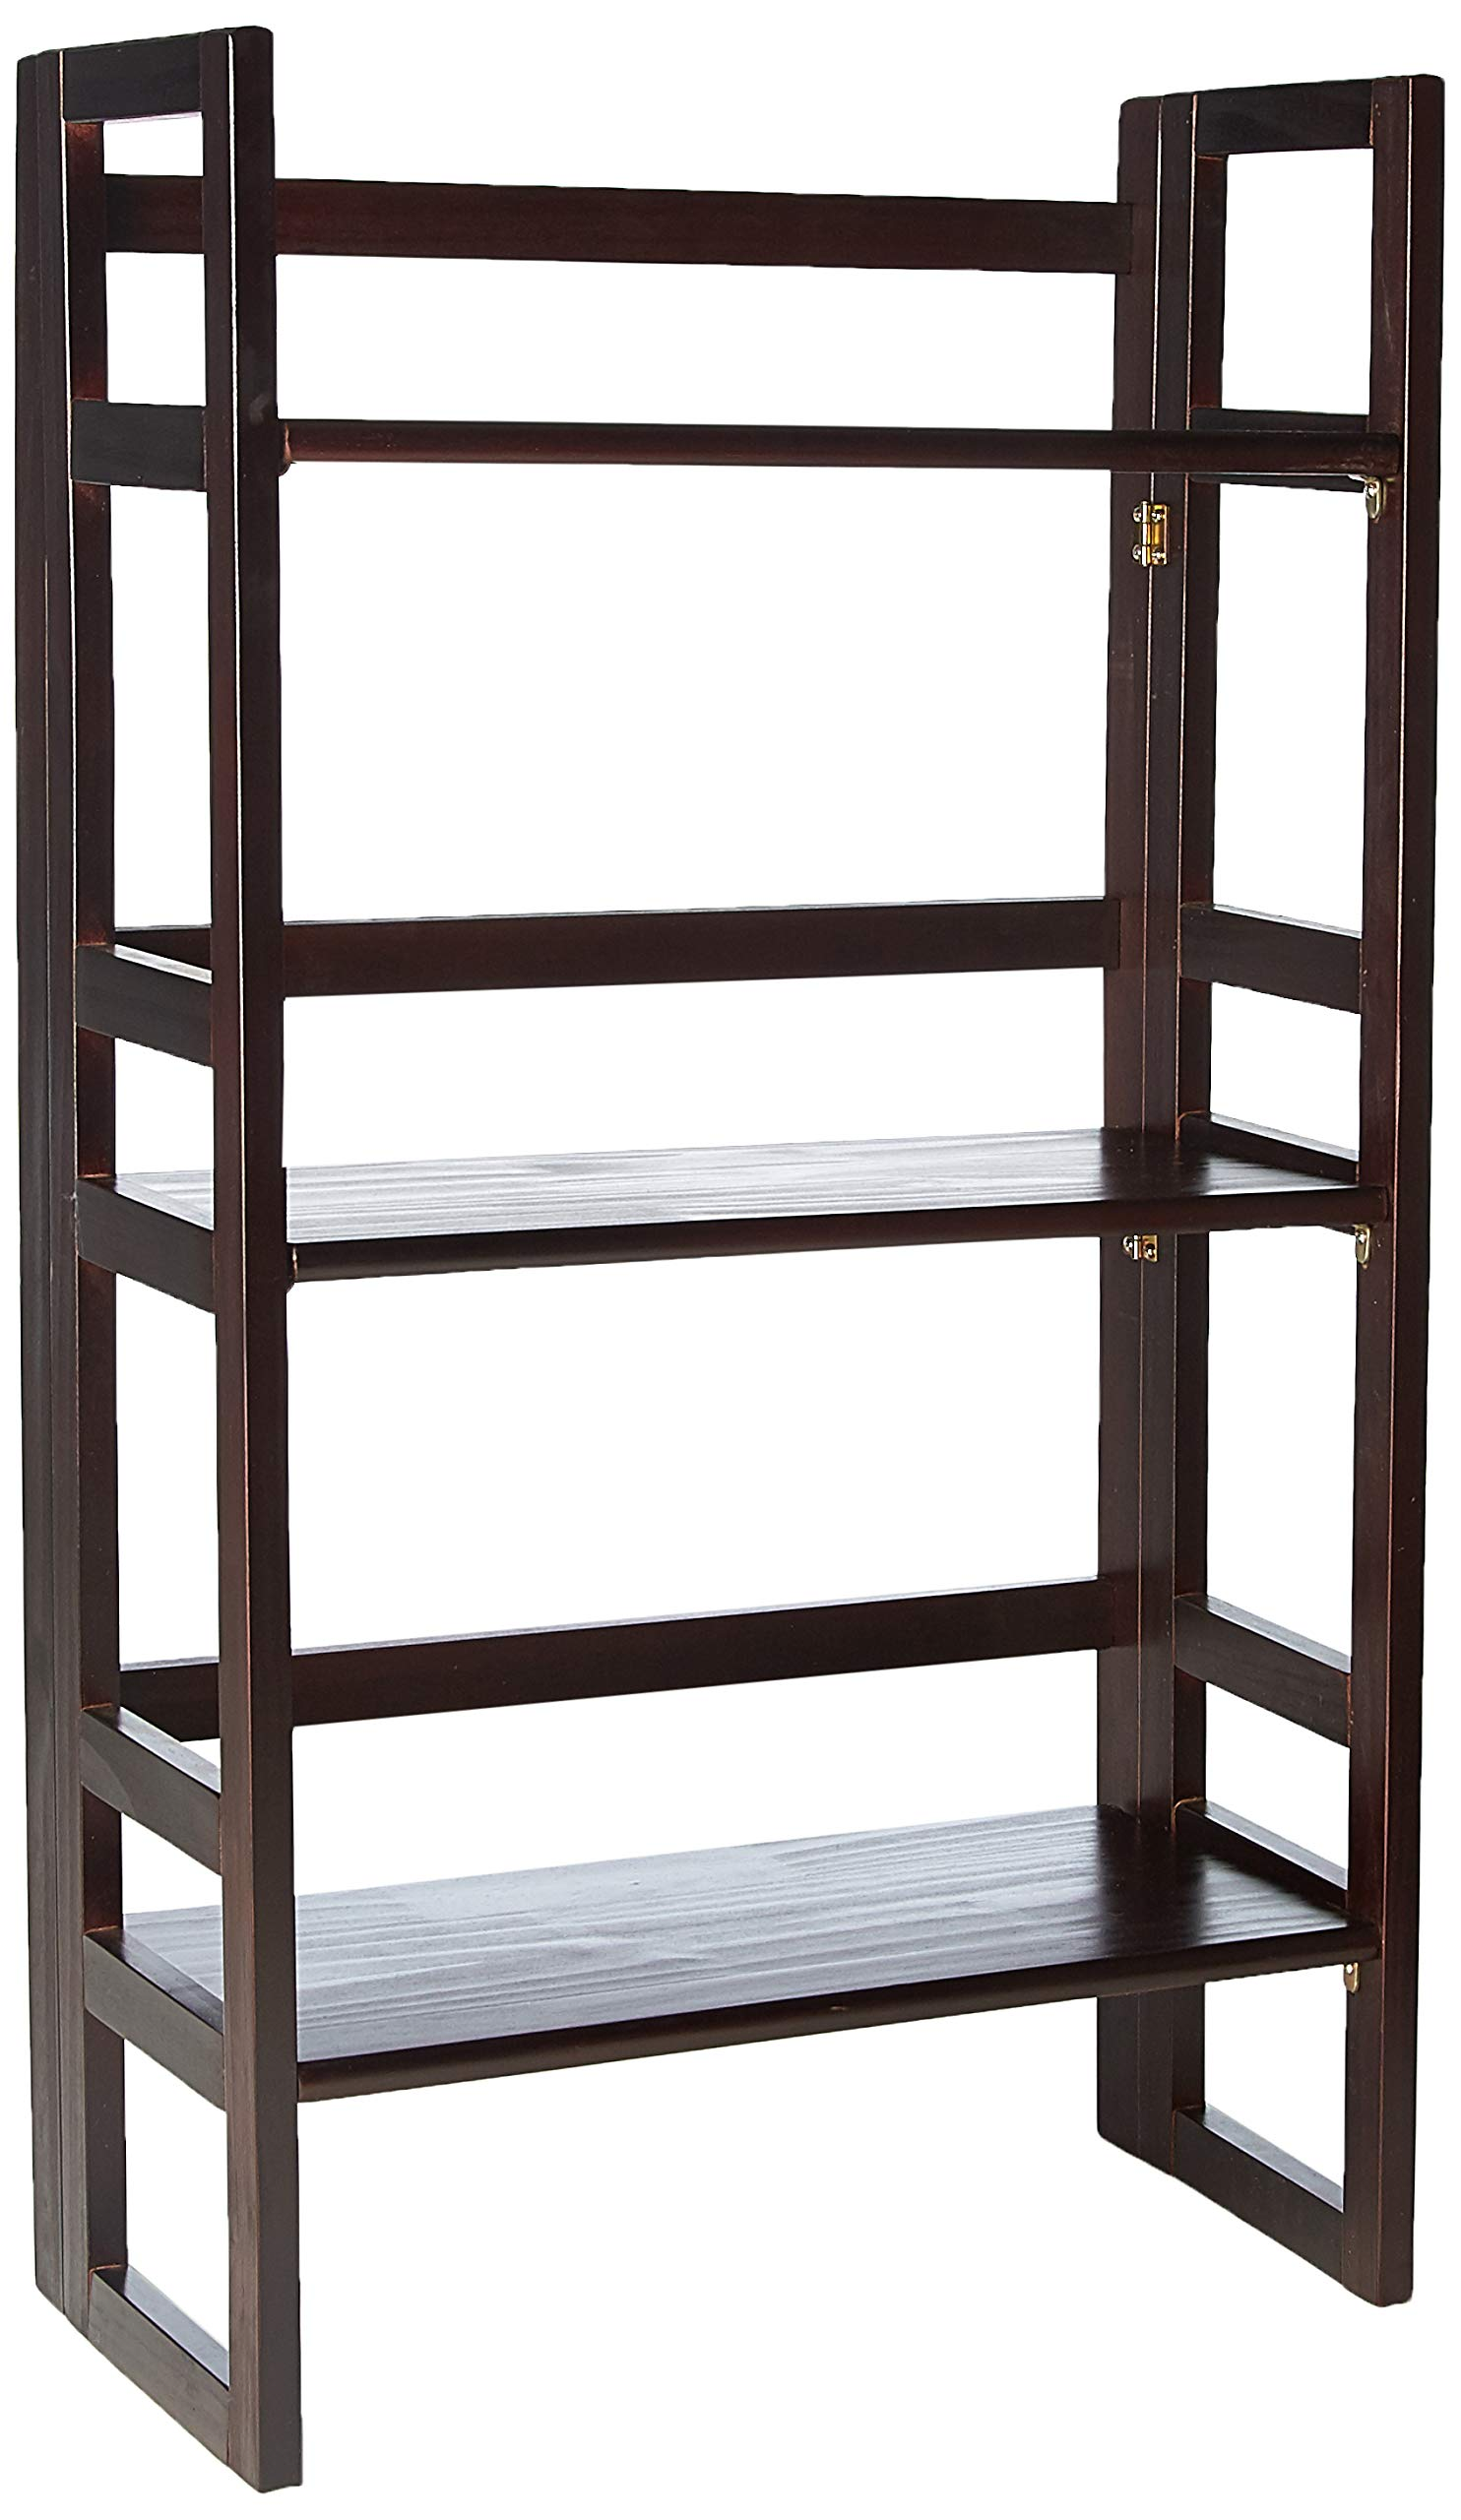 Casual Home 3-Shelf Folding Student Bookcase (20.75'' Wide)-Espresso